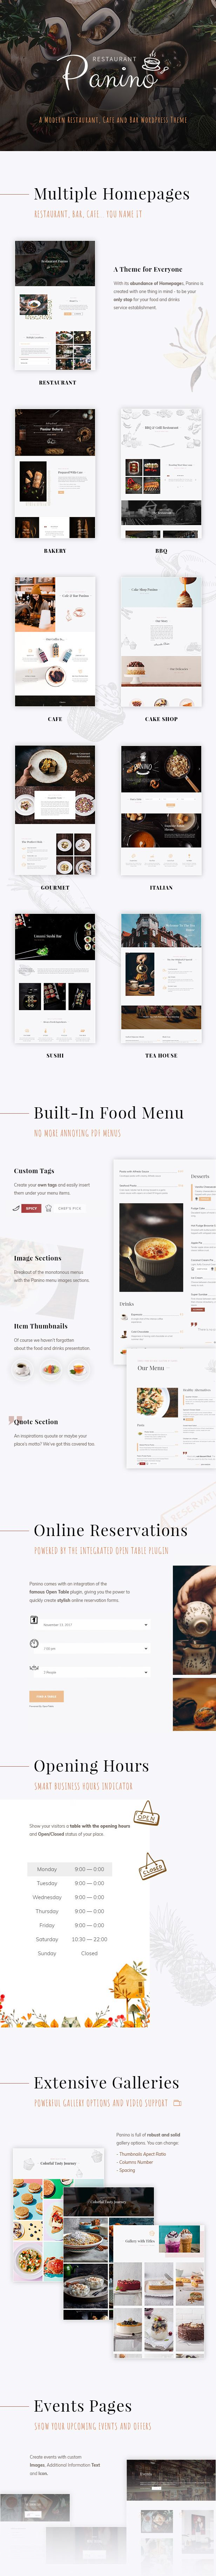 Panino - A Modern Restaurant and Cafe WordPress Theme 5